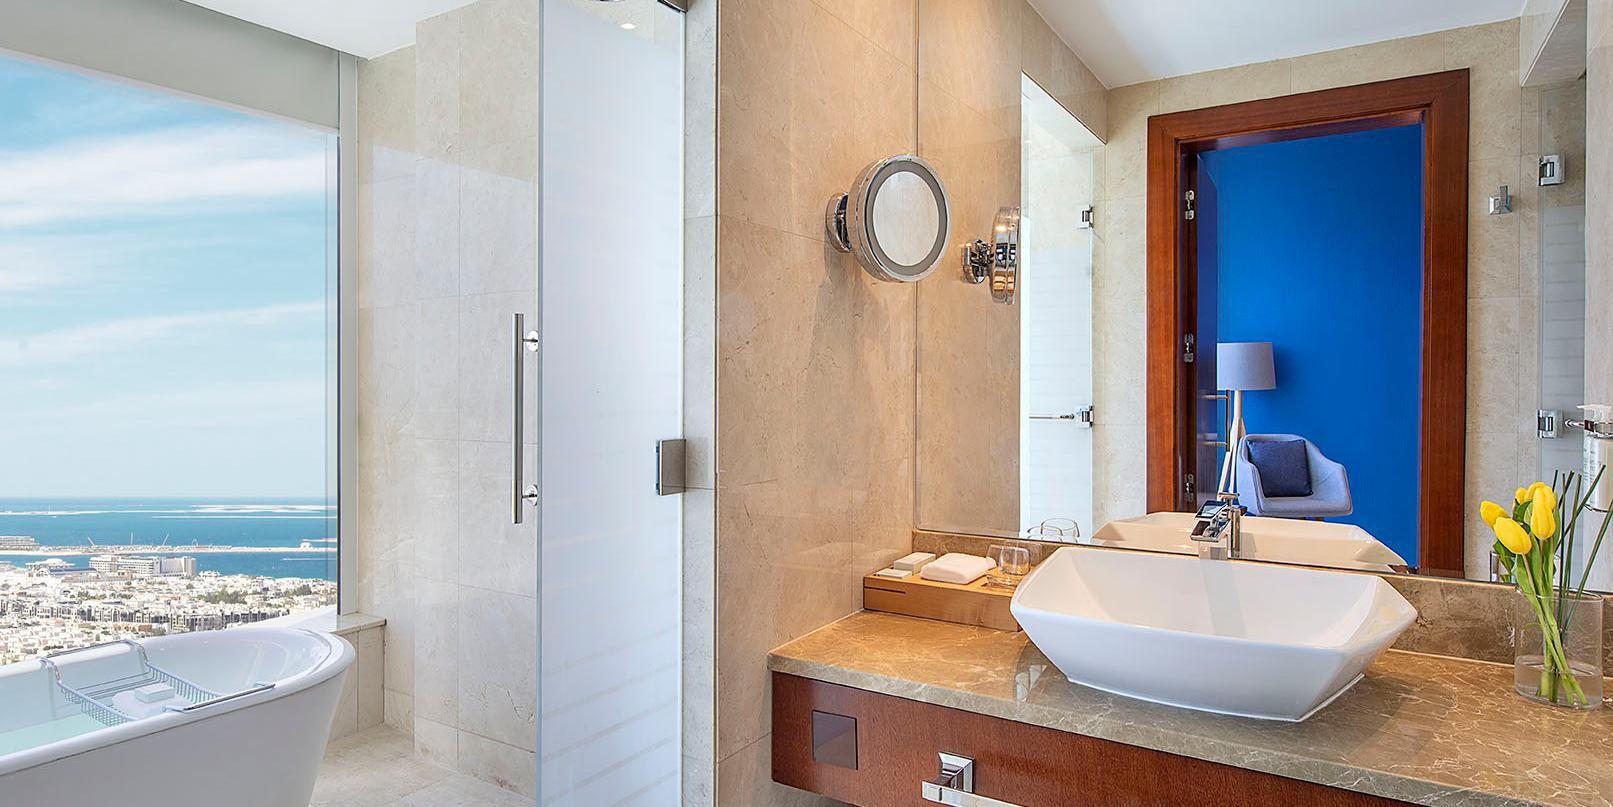 Superior Room bathroom, with views of Jumeirah Beach